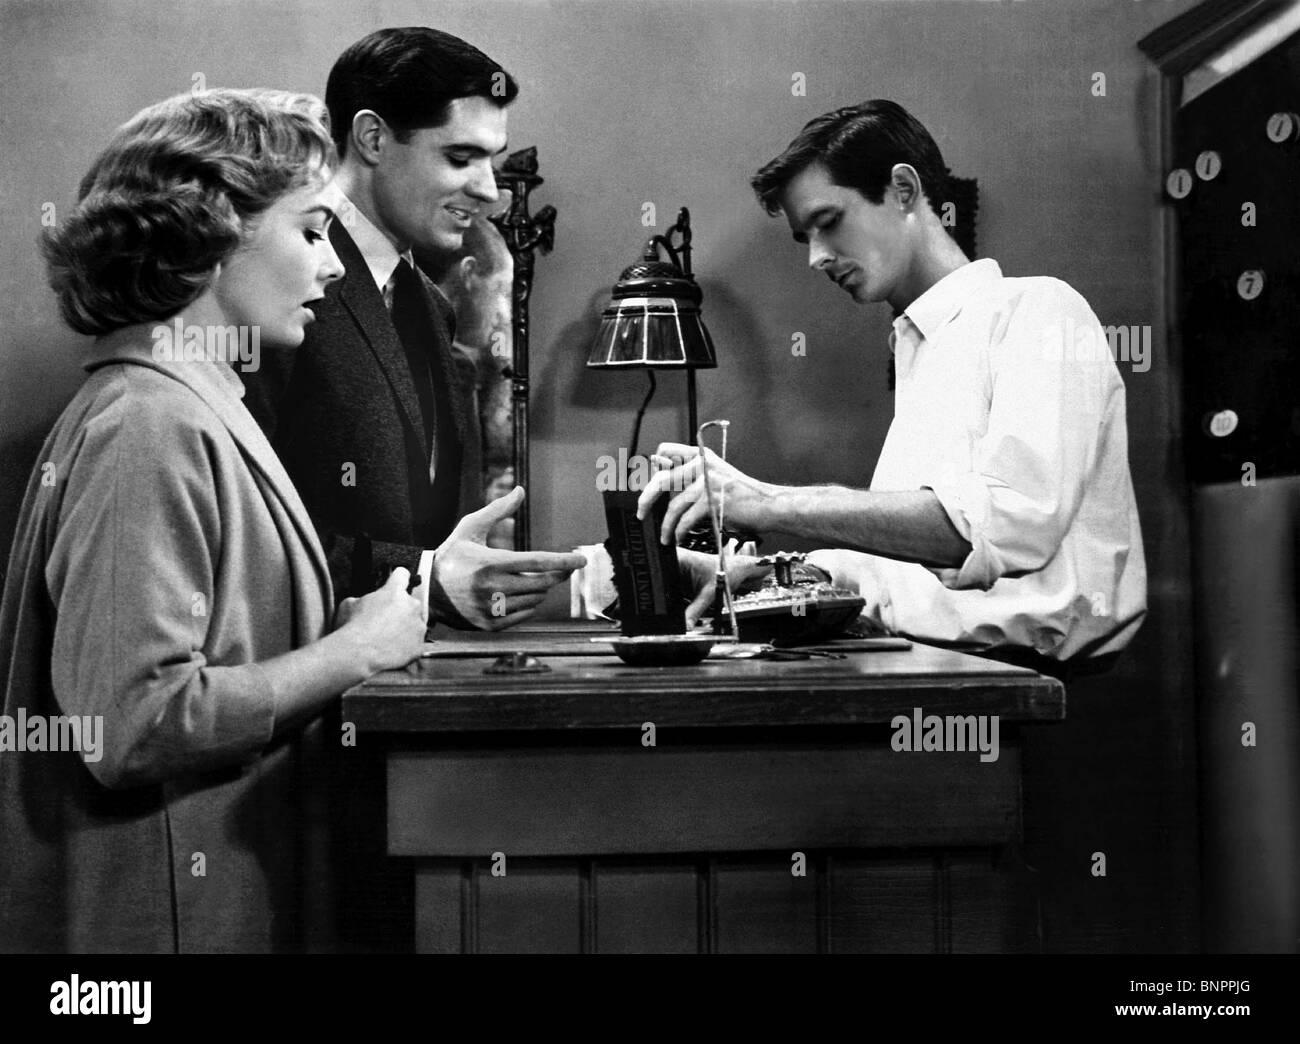 VERA MILLS JOHN GAVIN ANTHONY PERKINS PSYCHO (1960) - Stock Image